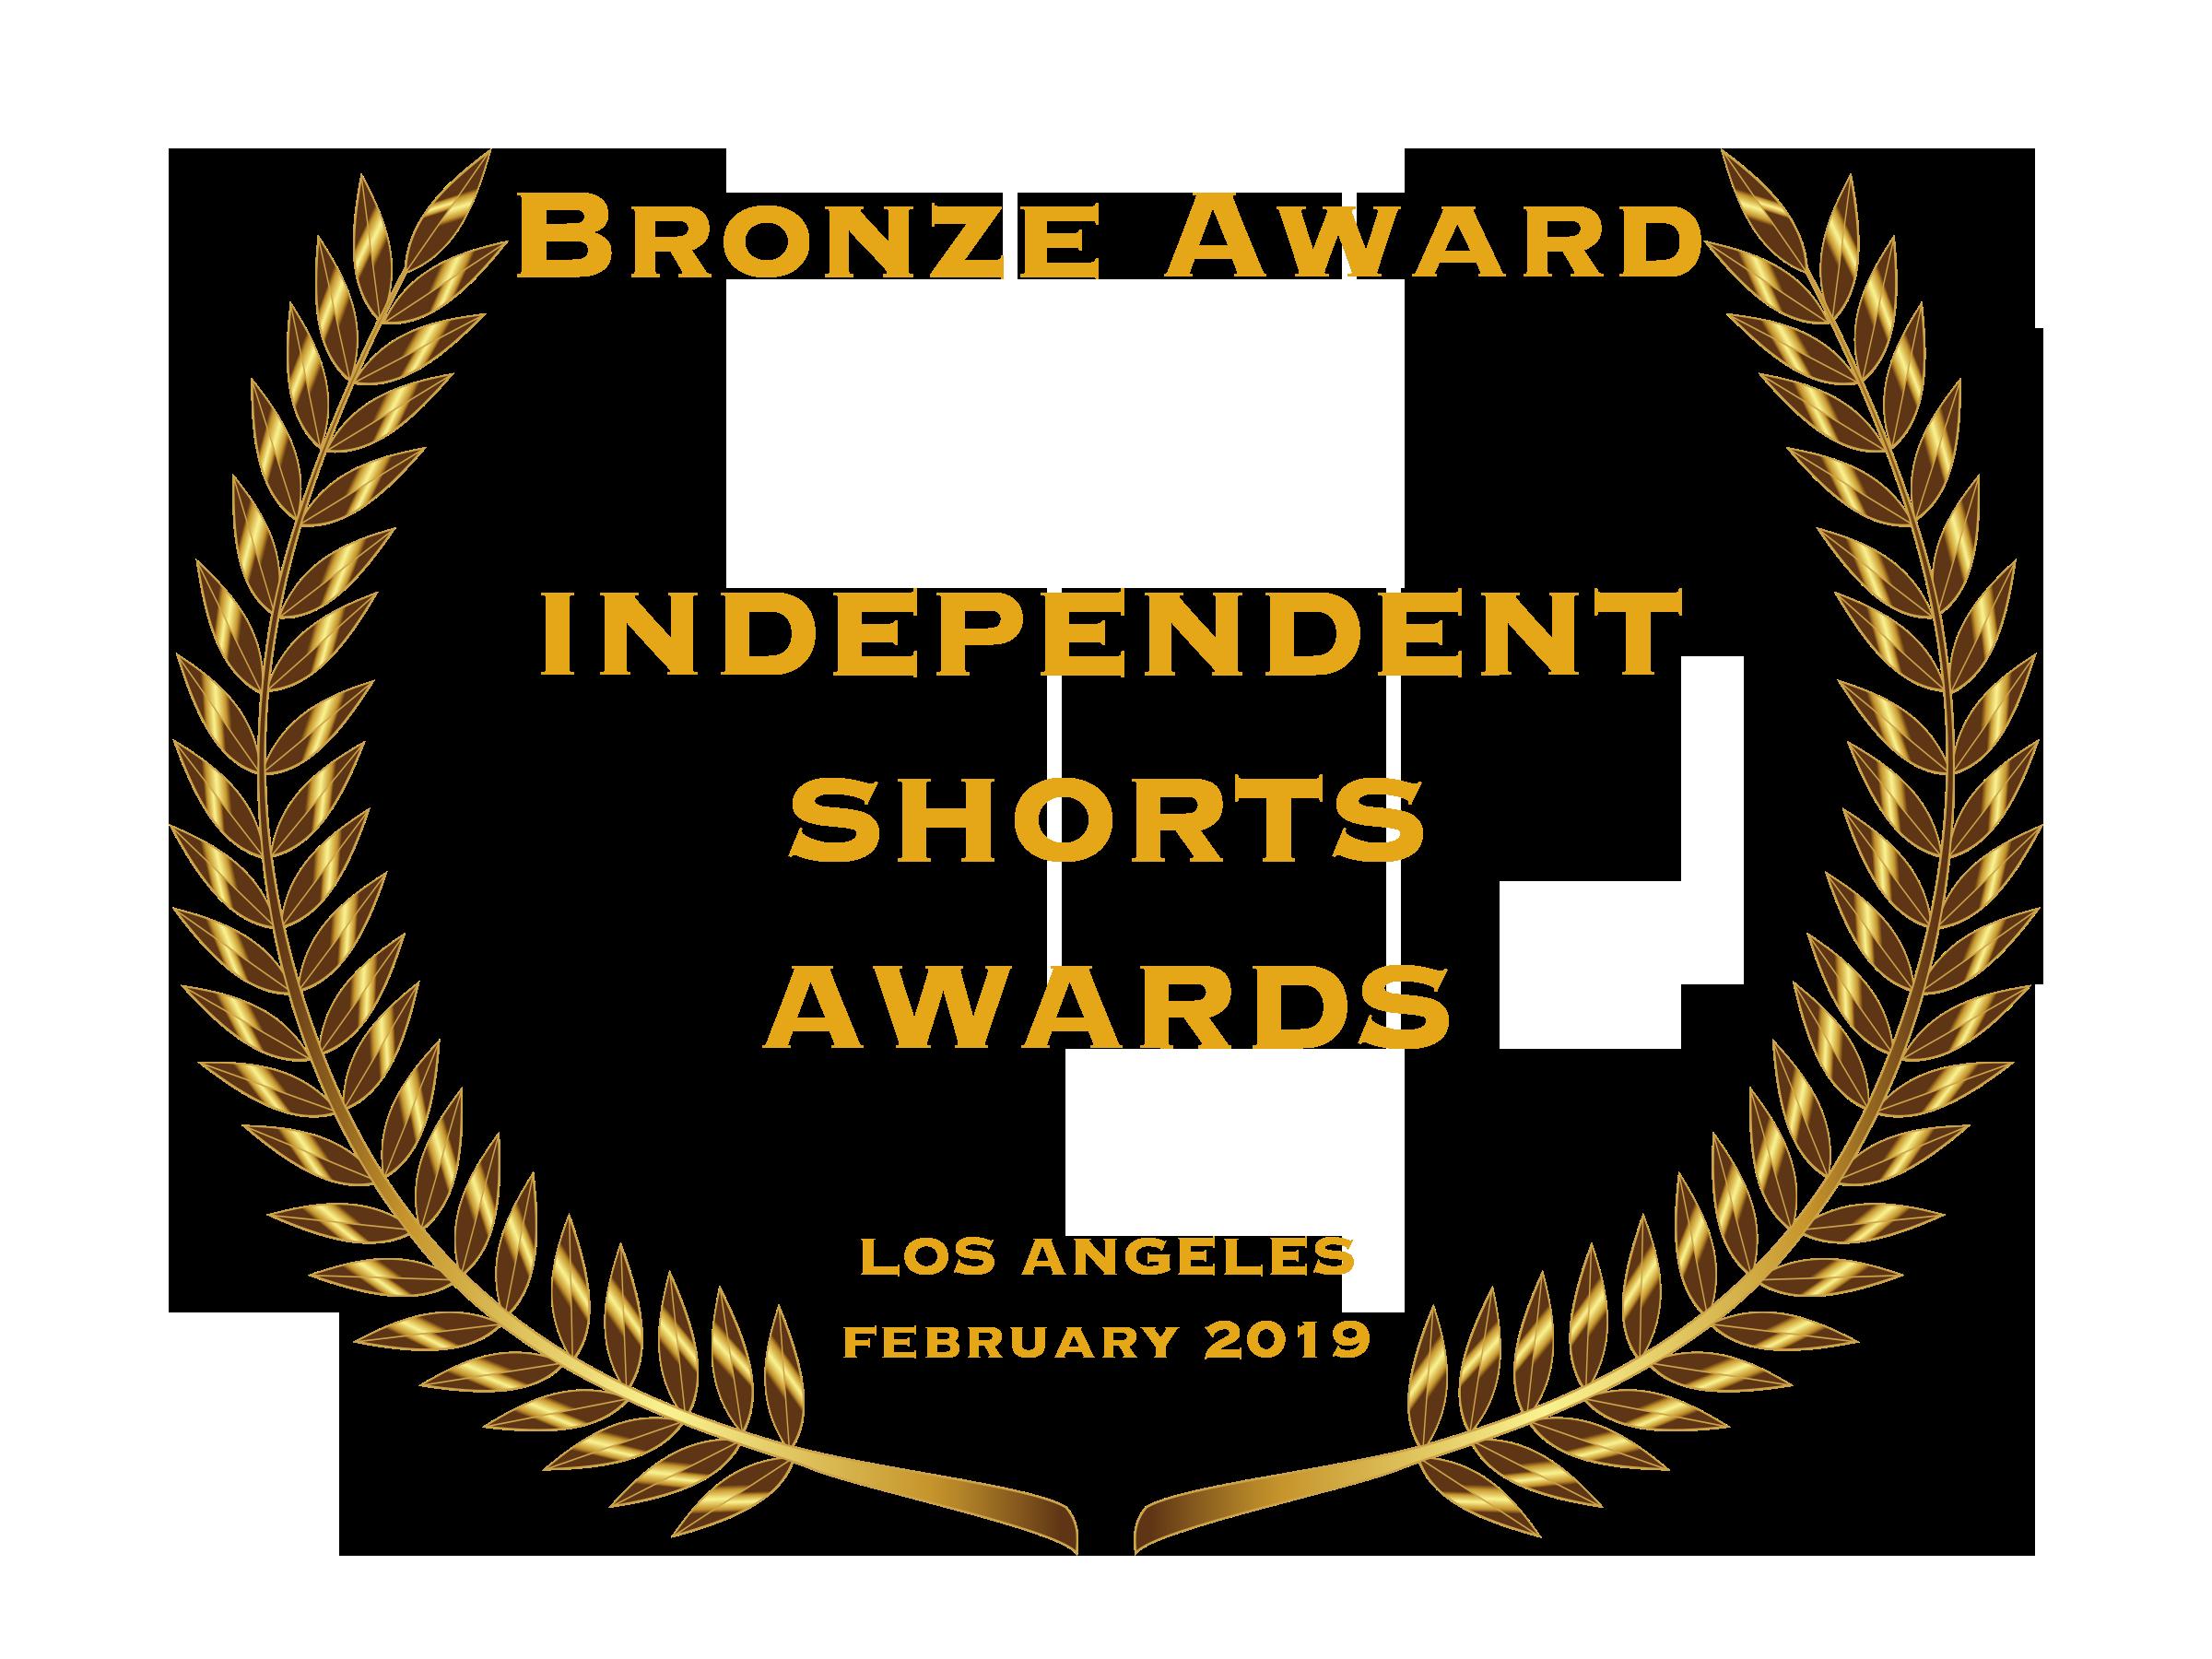 Independent Shorts Awards ~ Bronze Award Best Documentary Short